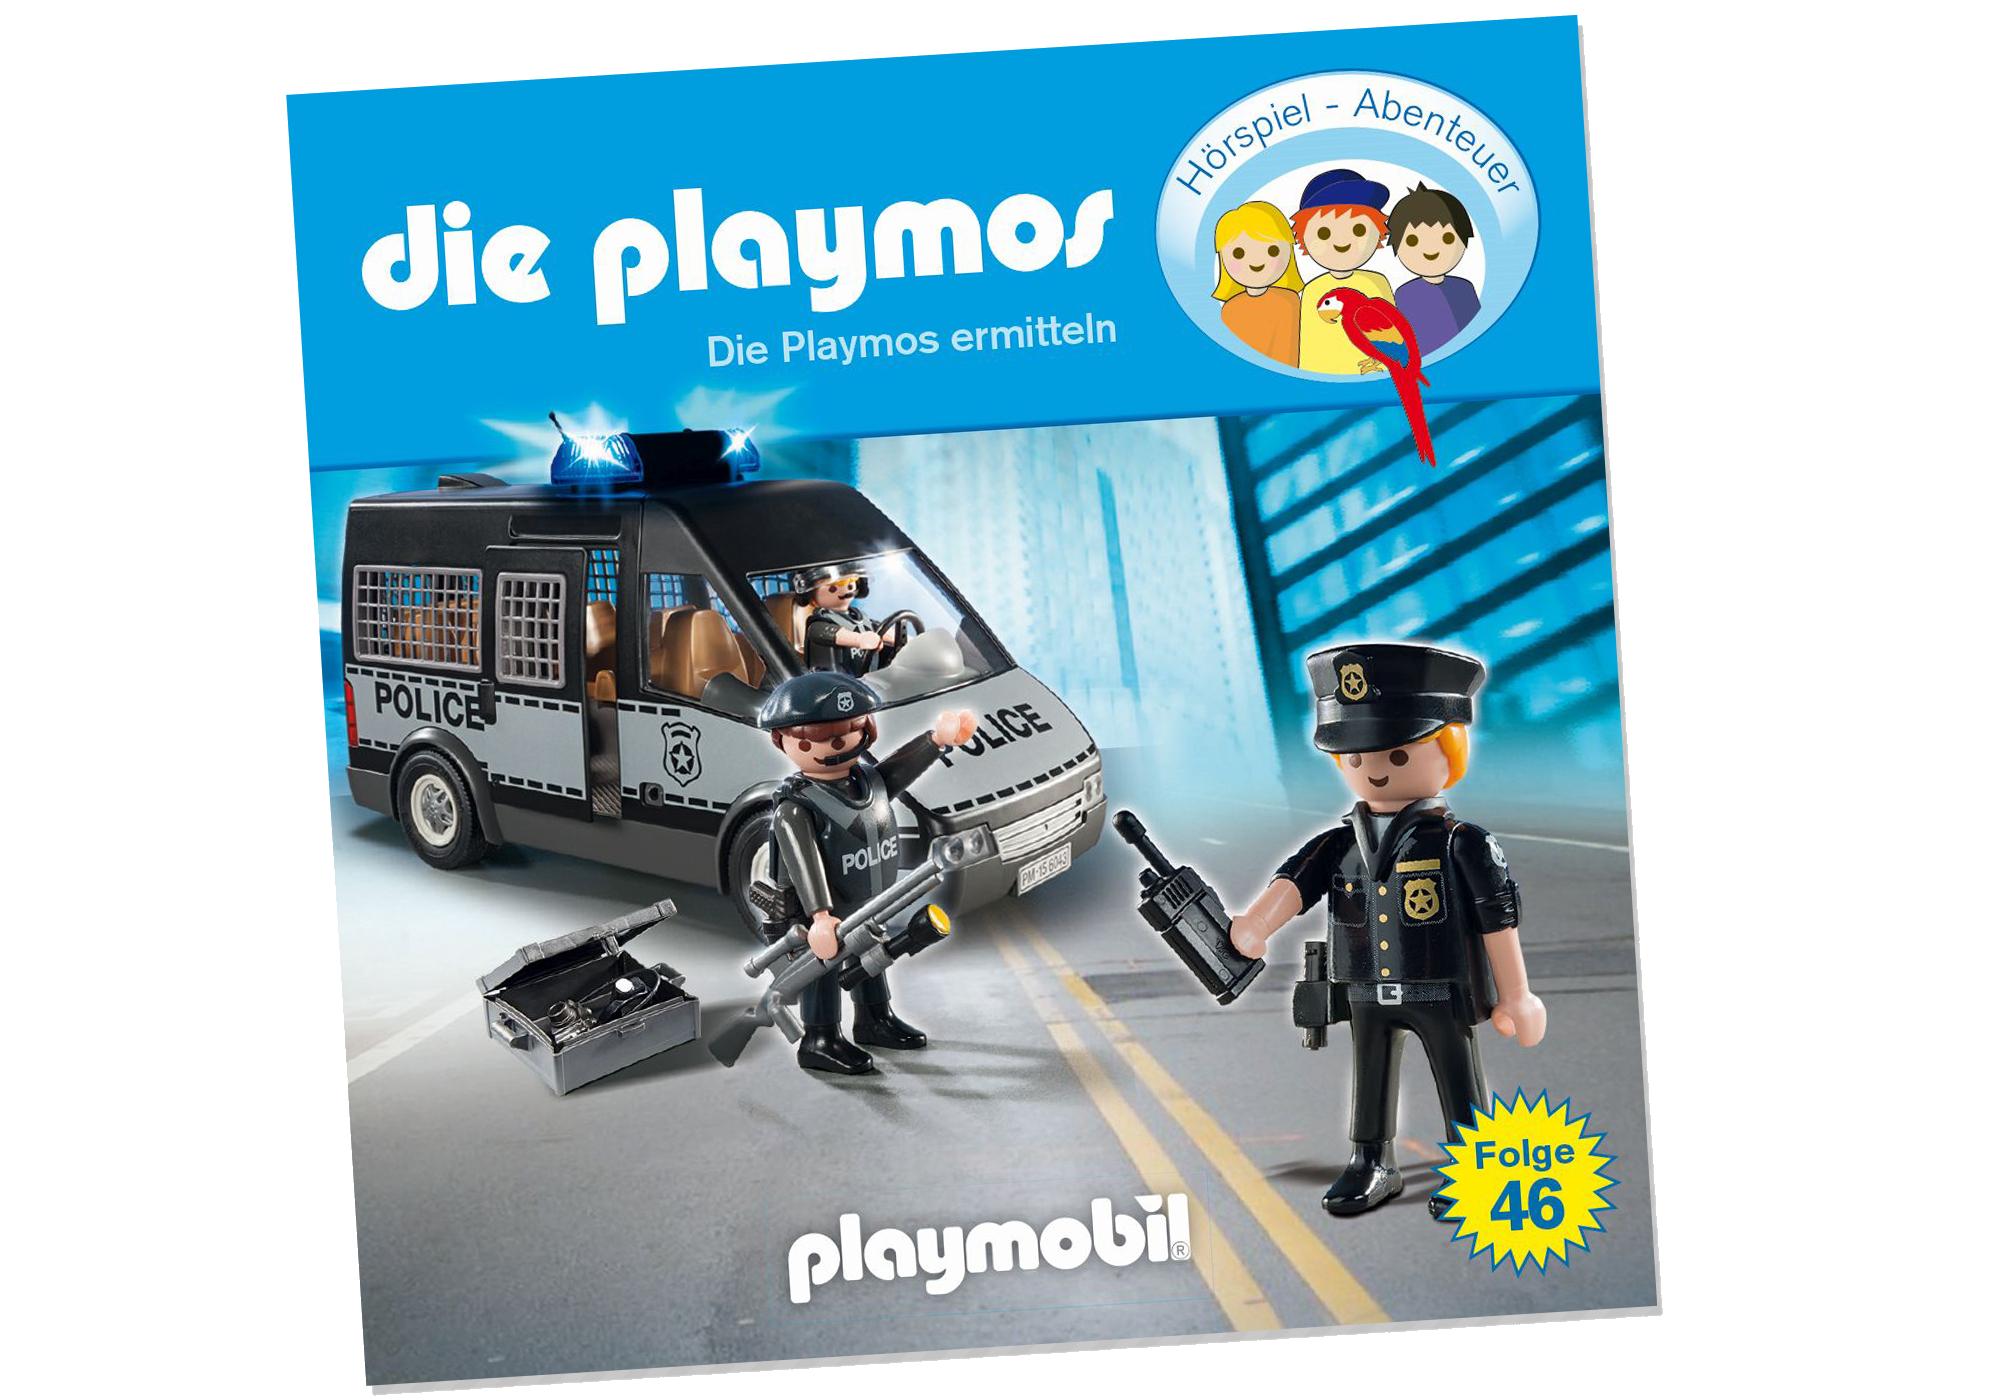 http://media.playmobil.com/i/playmobil/80253_product_detail